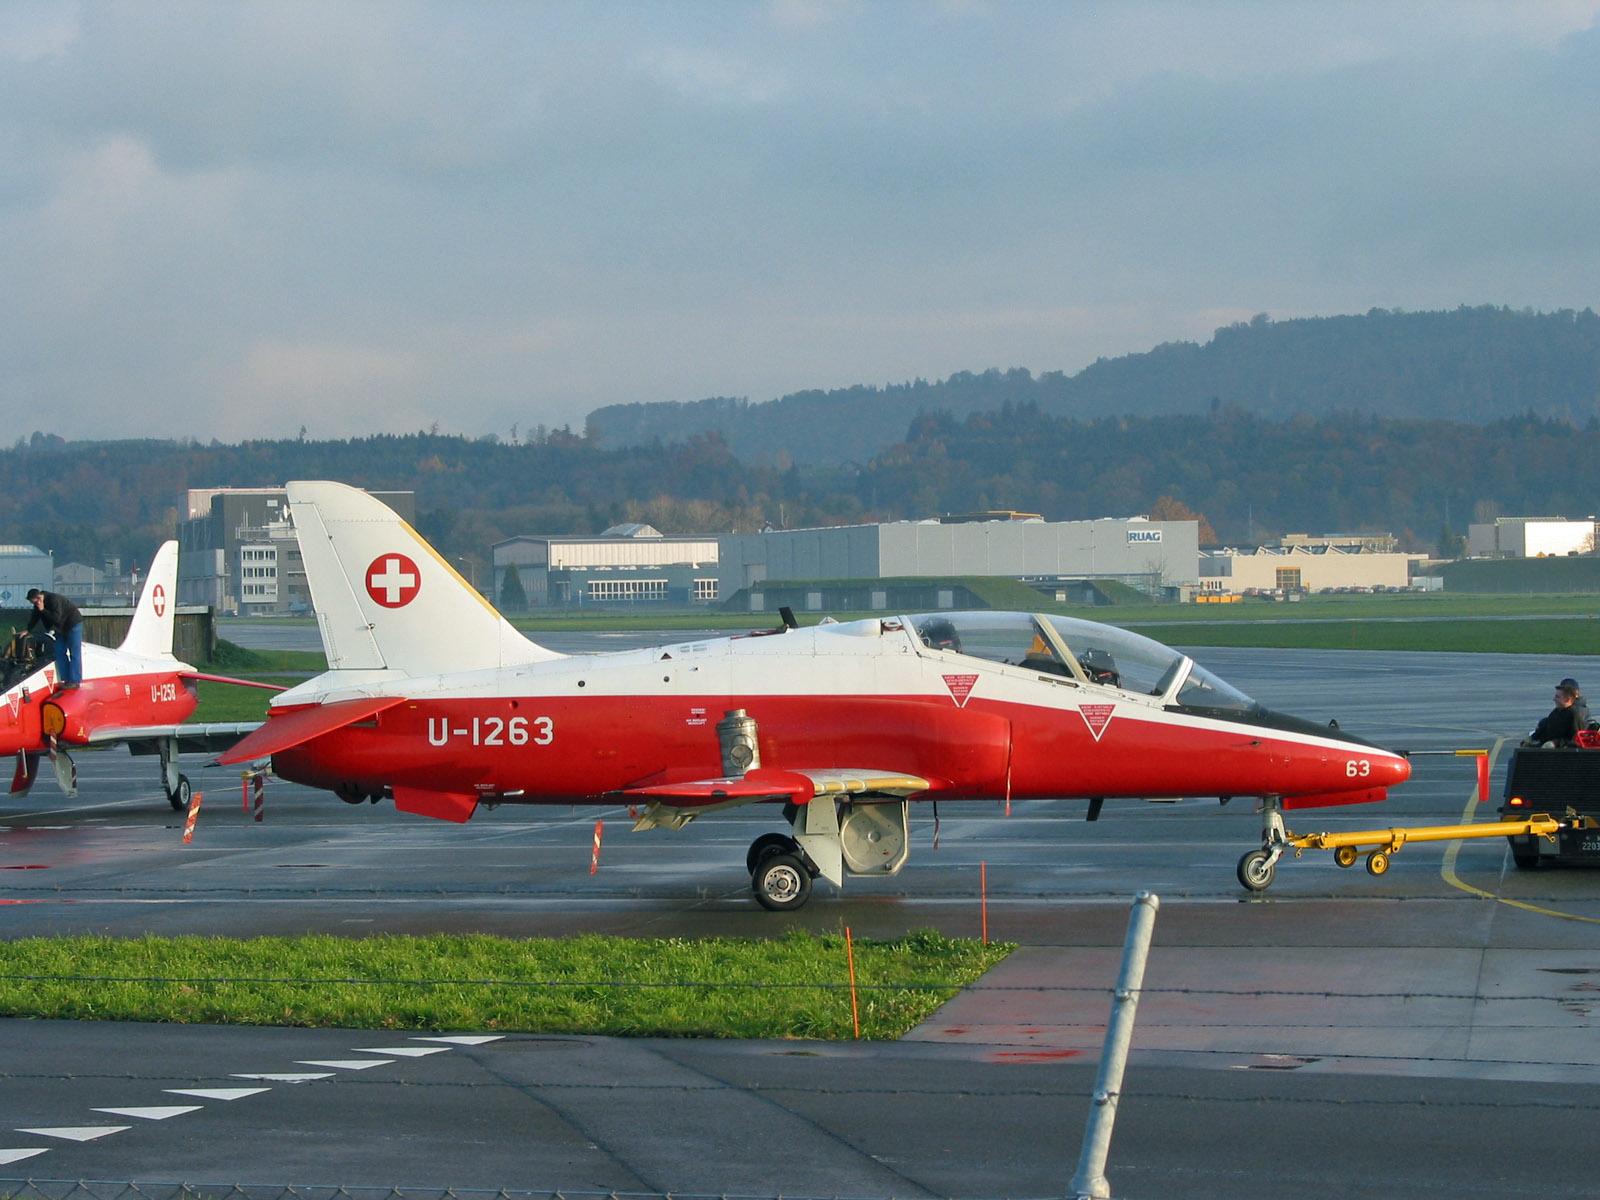 BAe Hawk Mk 66 U-1263